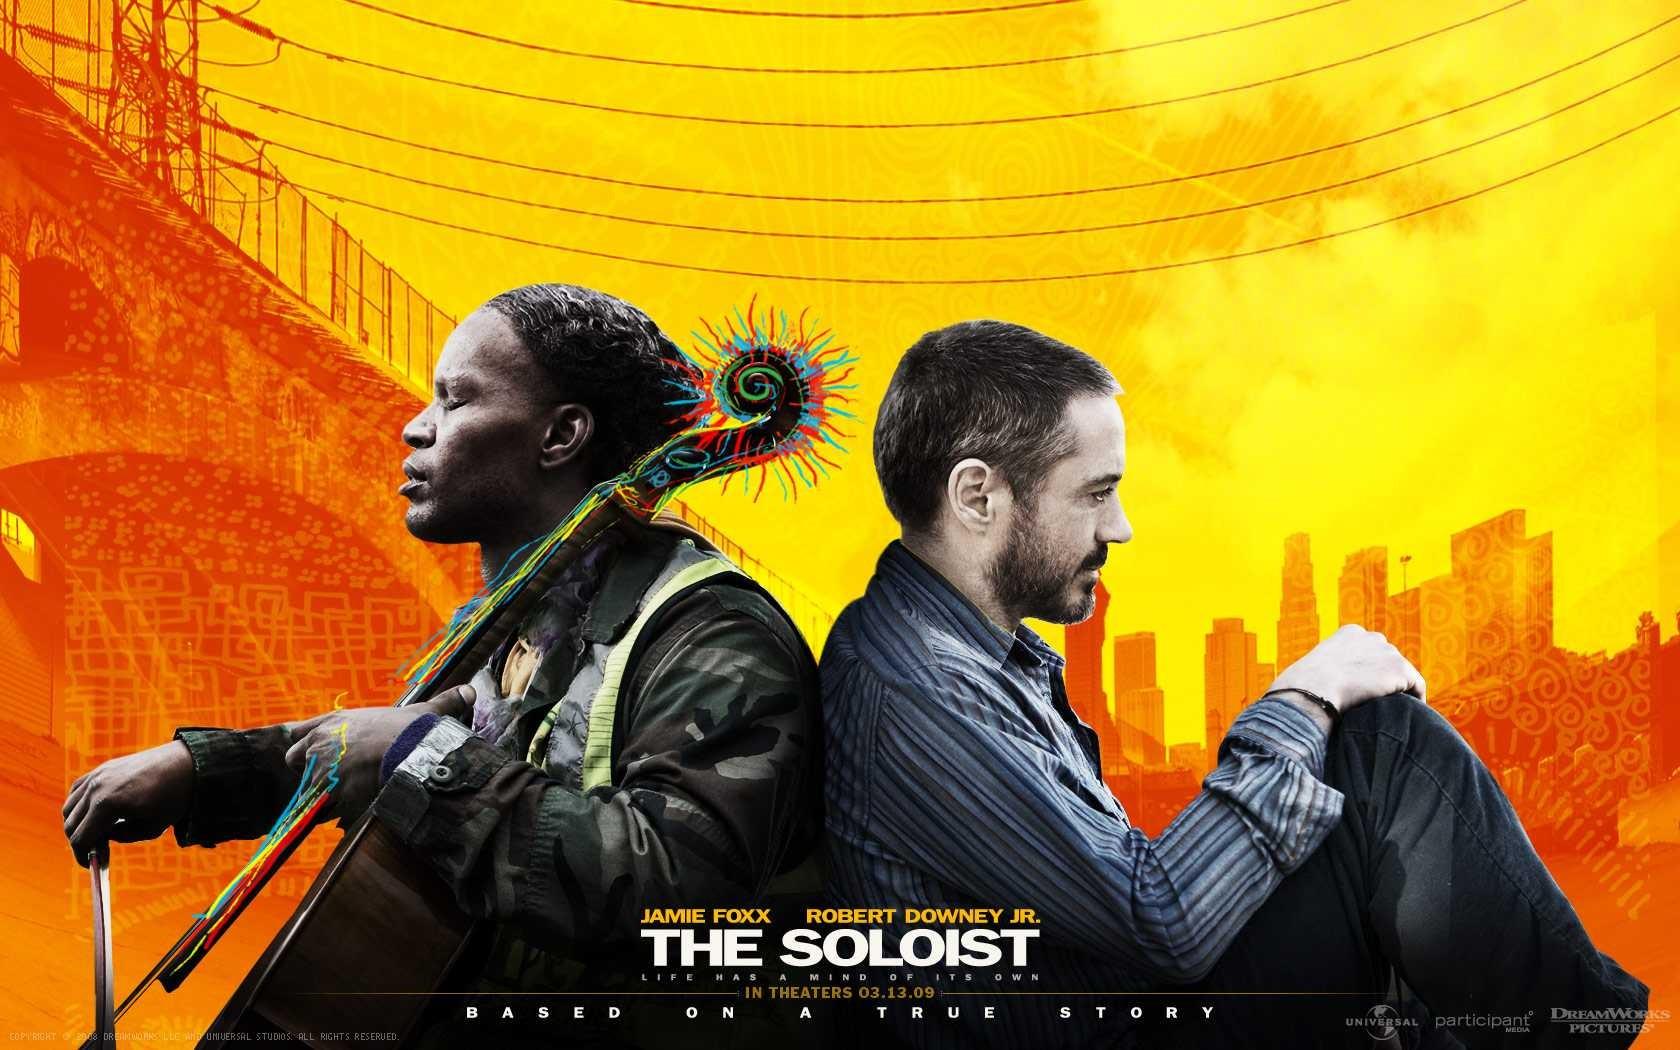 Wallpaper del film The Soloist con Jamie Foxx e Robert Downey Jr.